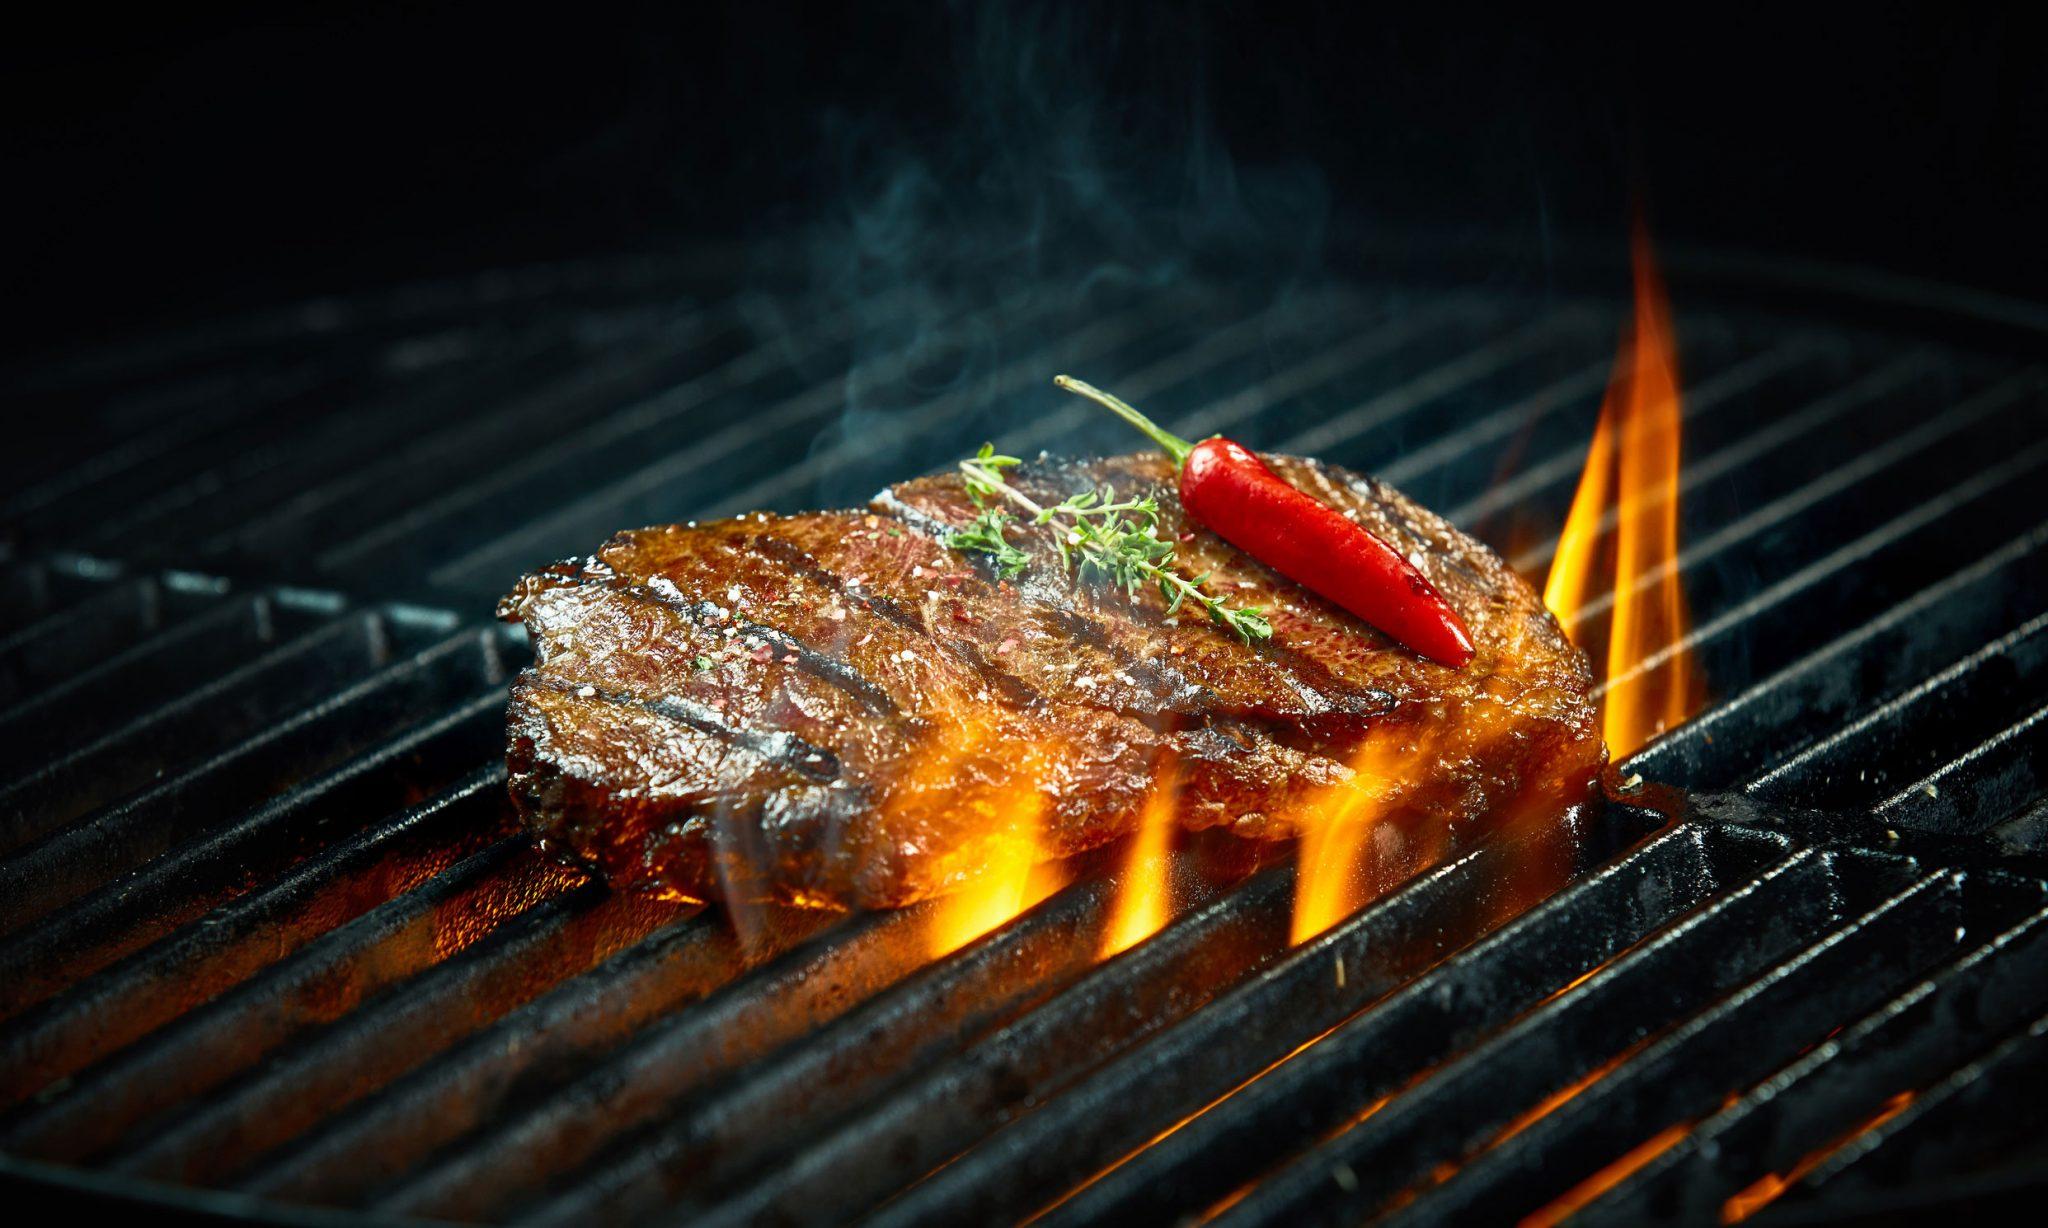 Grill Steak Werbeagentur GAXWEB GmbH Karlsruhe